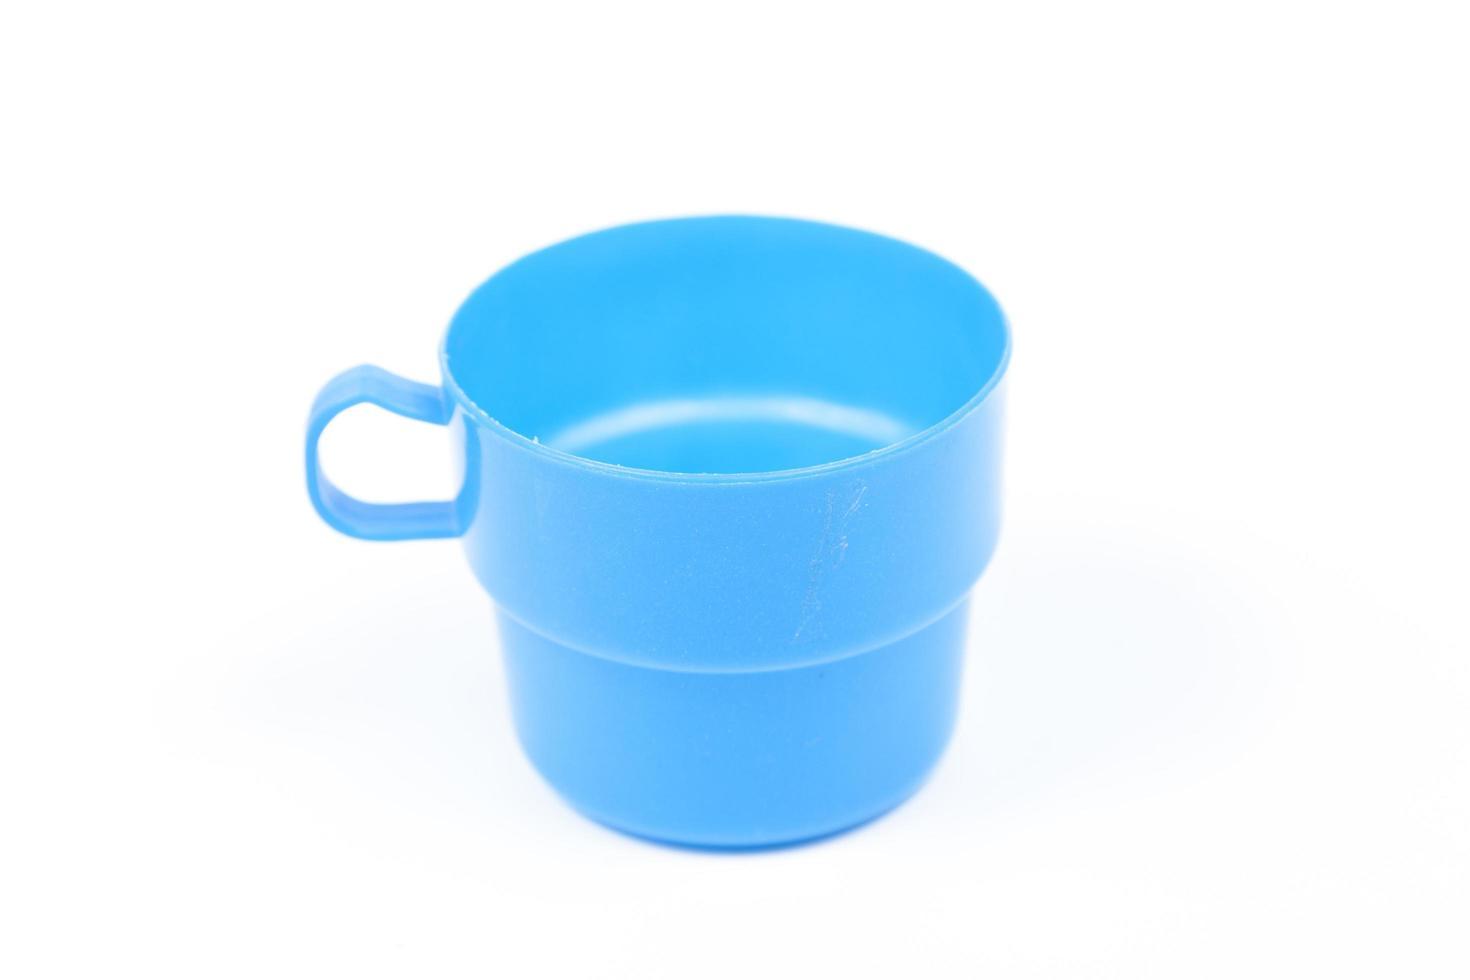 vetro di plastica blu foto